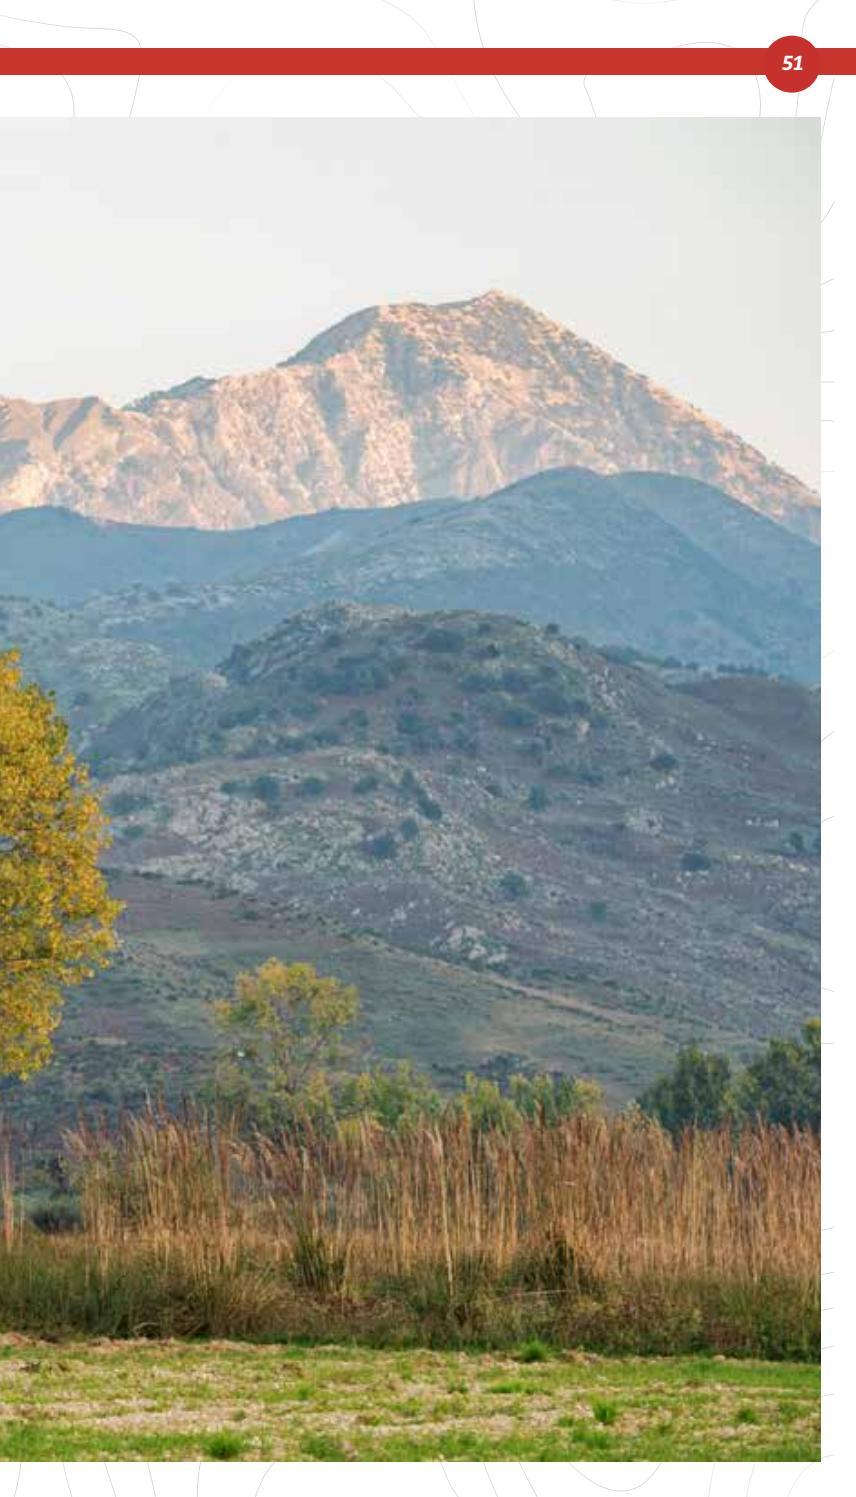 Hiking Trails in Himara Region page 51